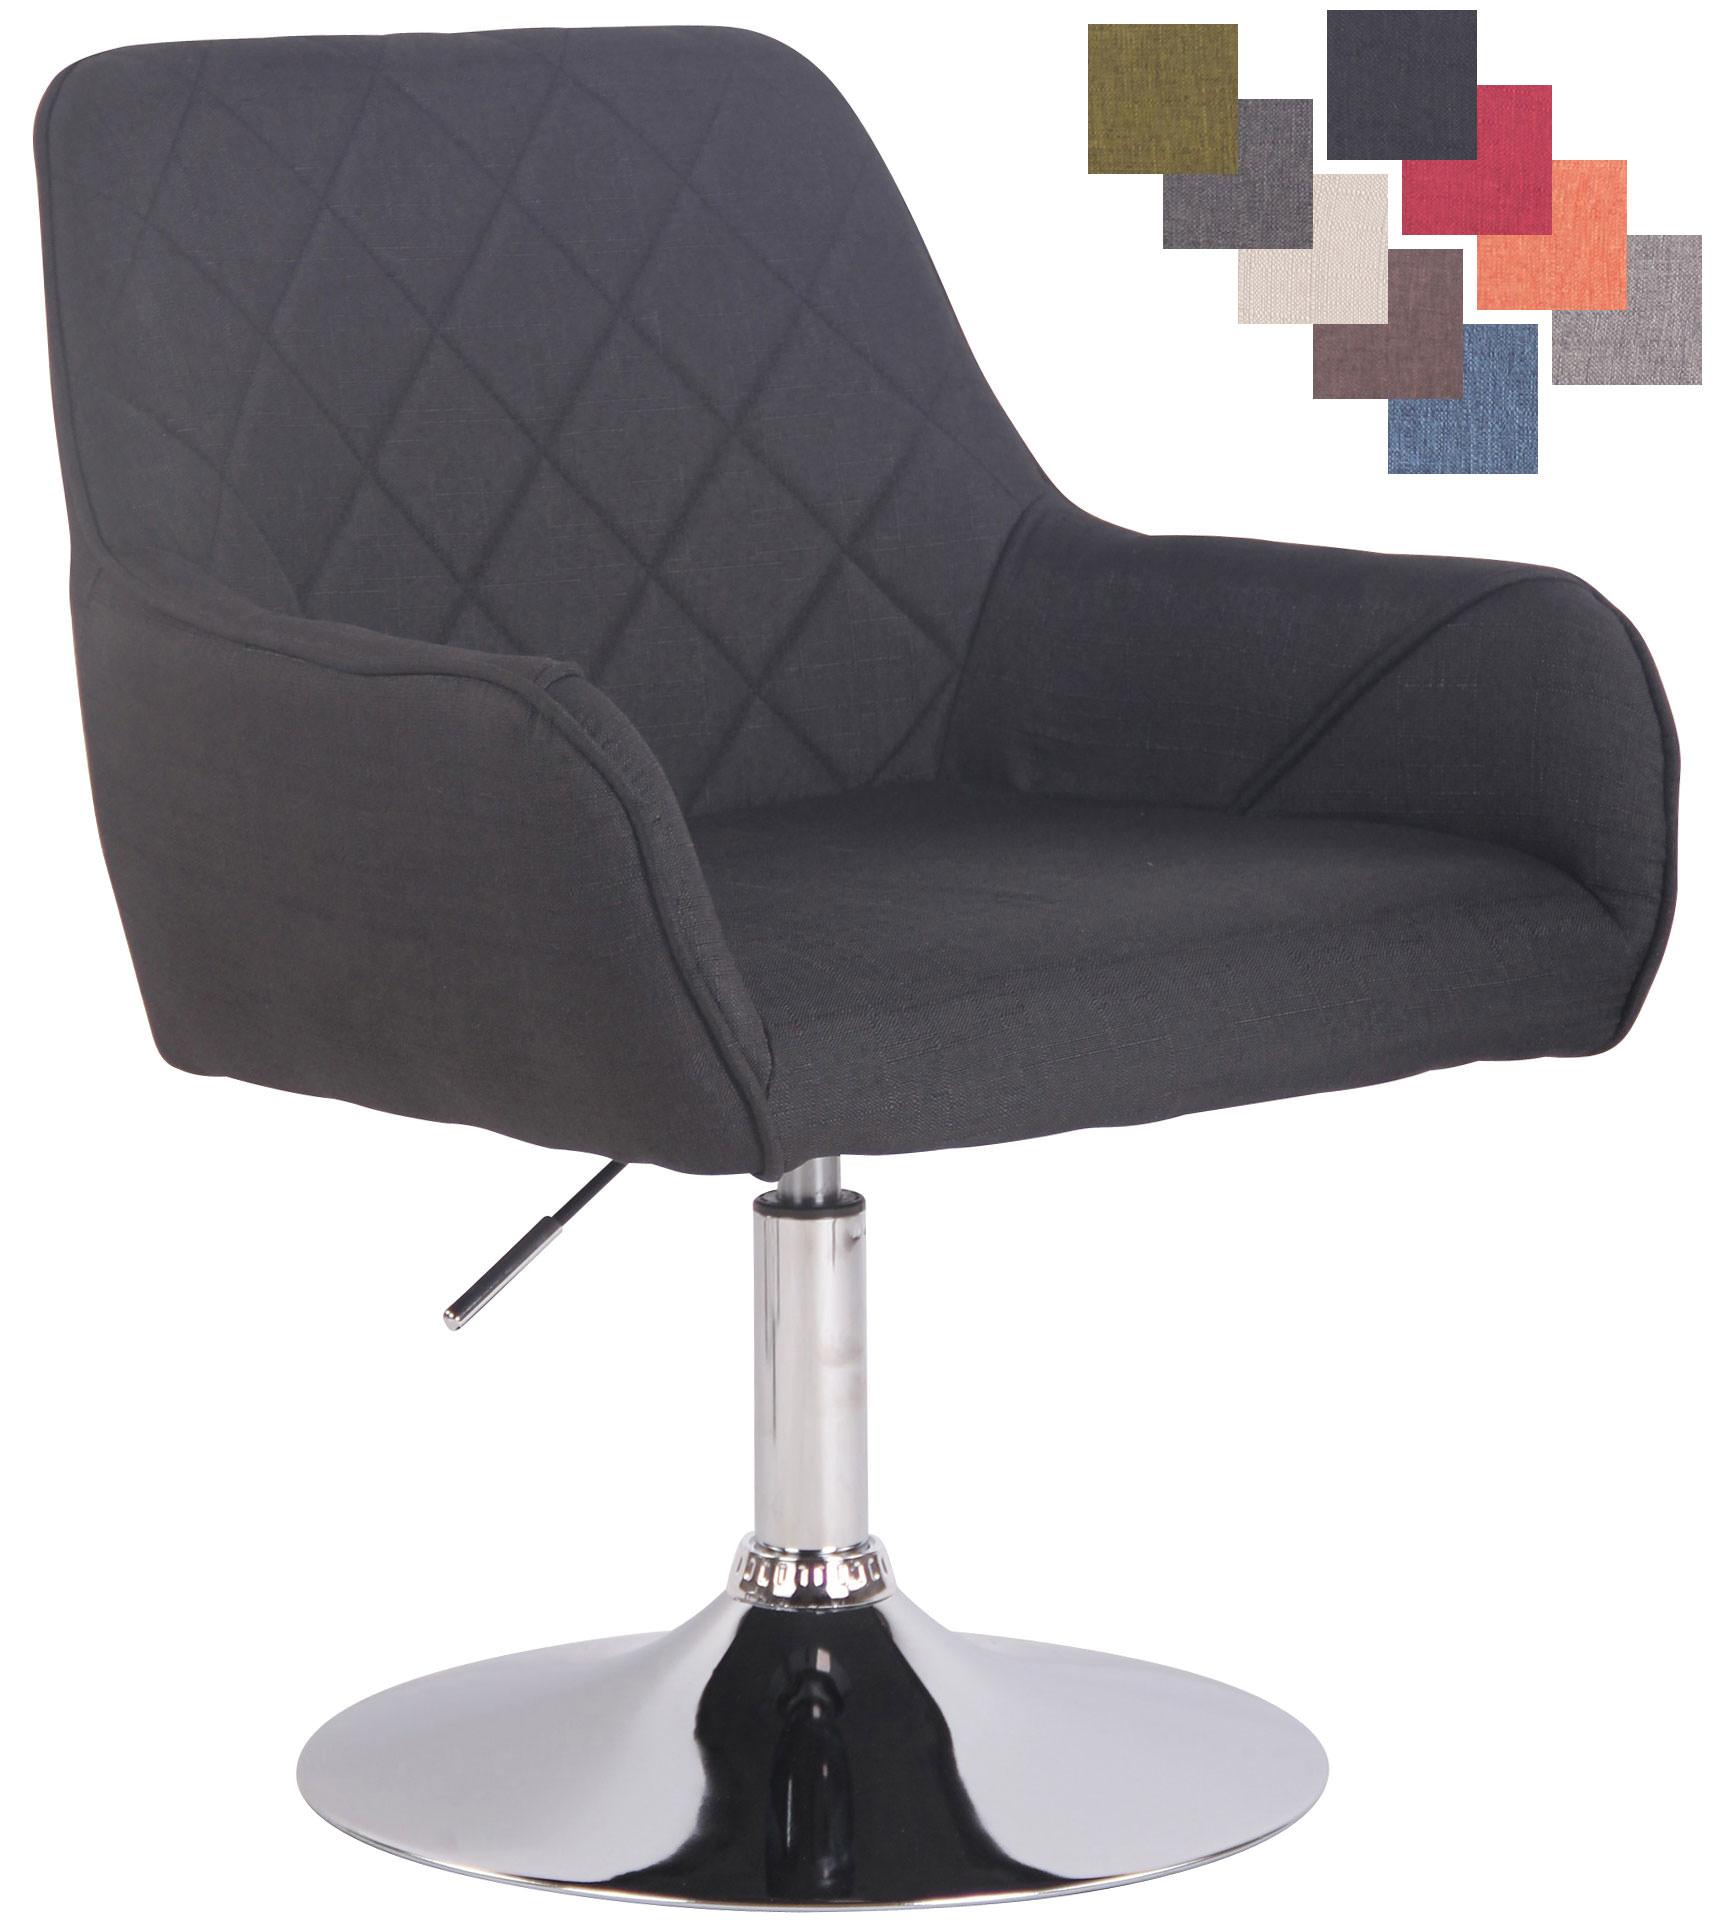 Dettagli su Poltrona Design Lounge Wellington Tessuto Sedia Cocktail Girevole 360° imbottita